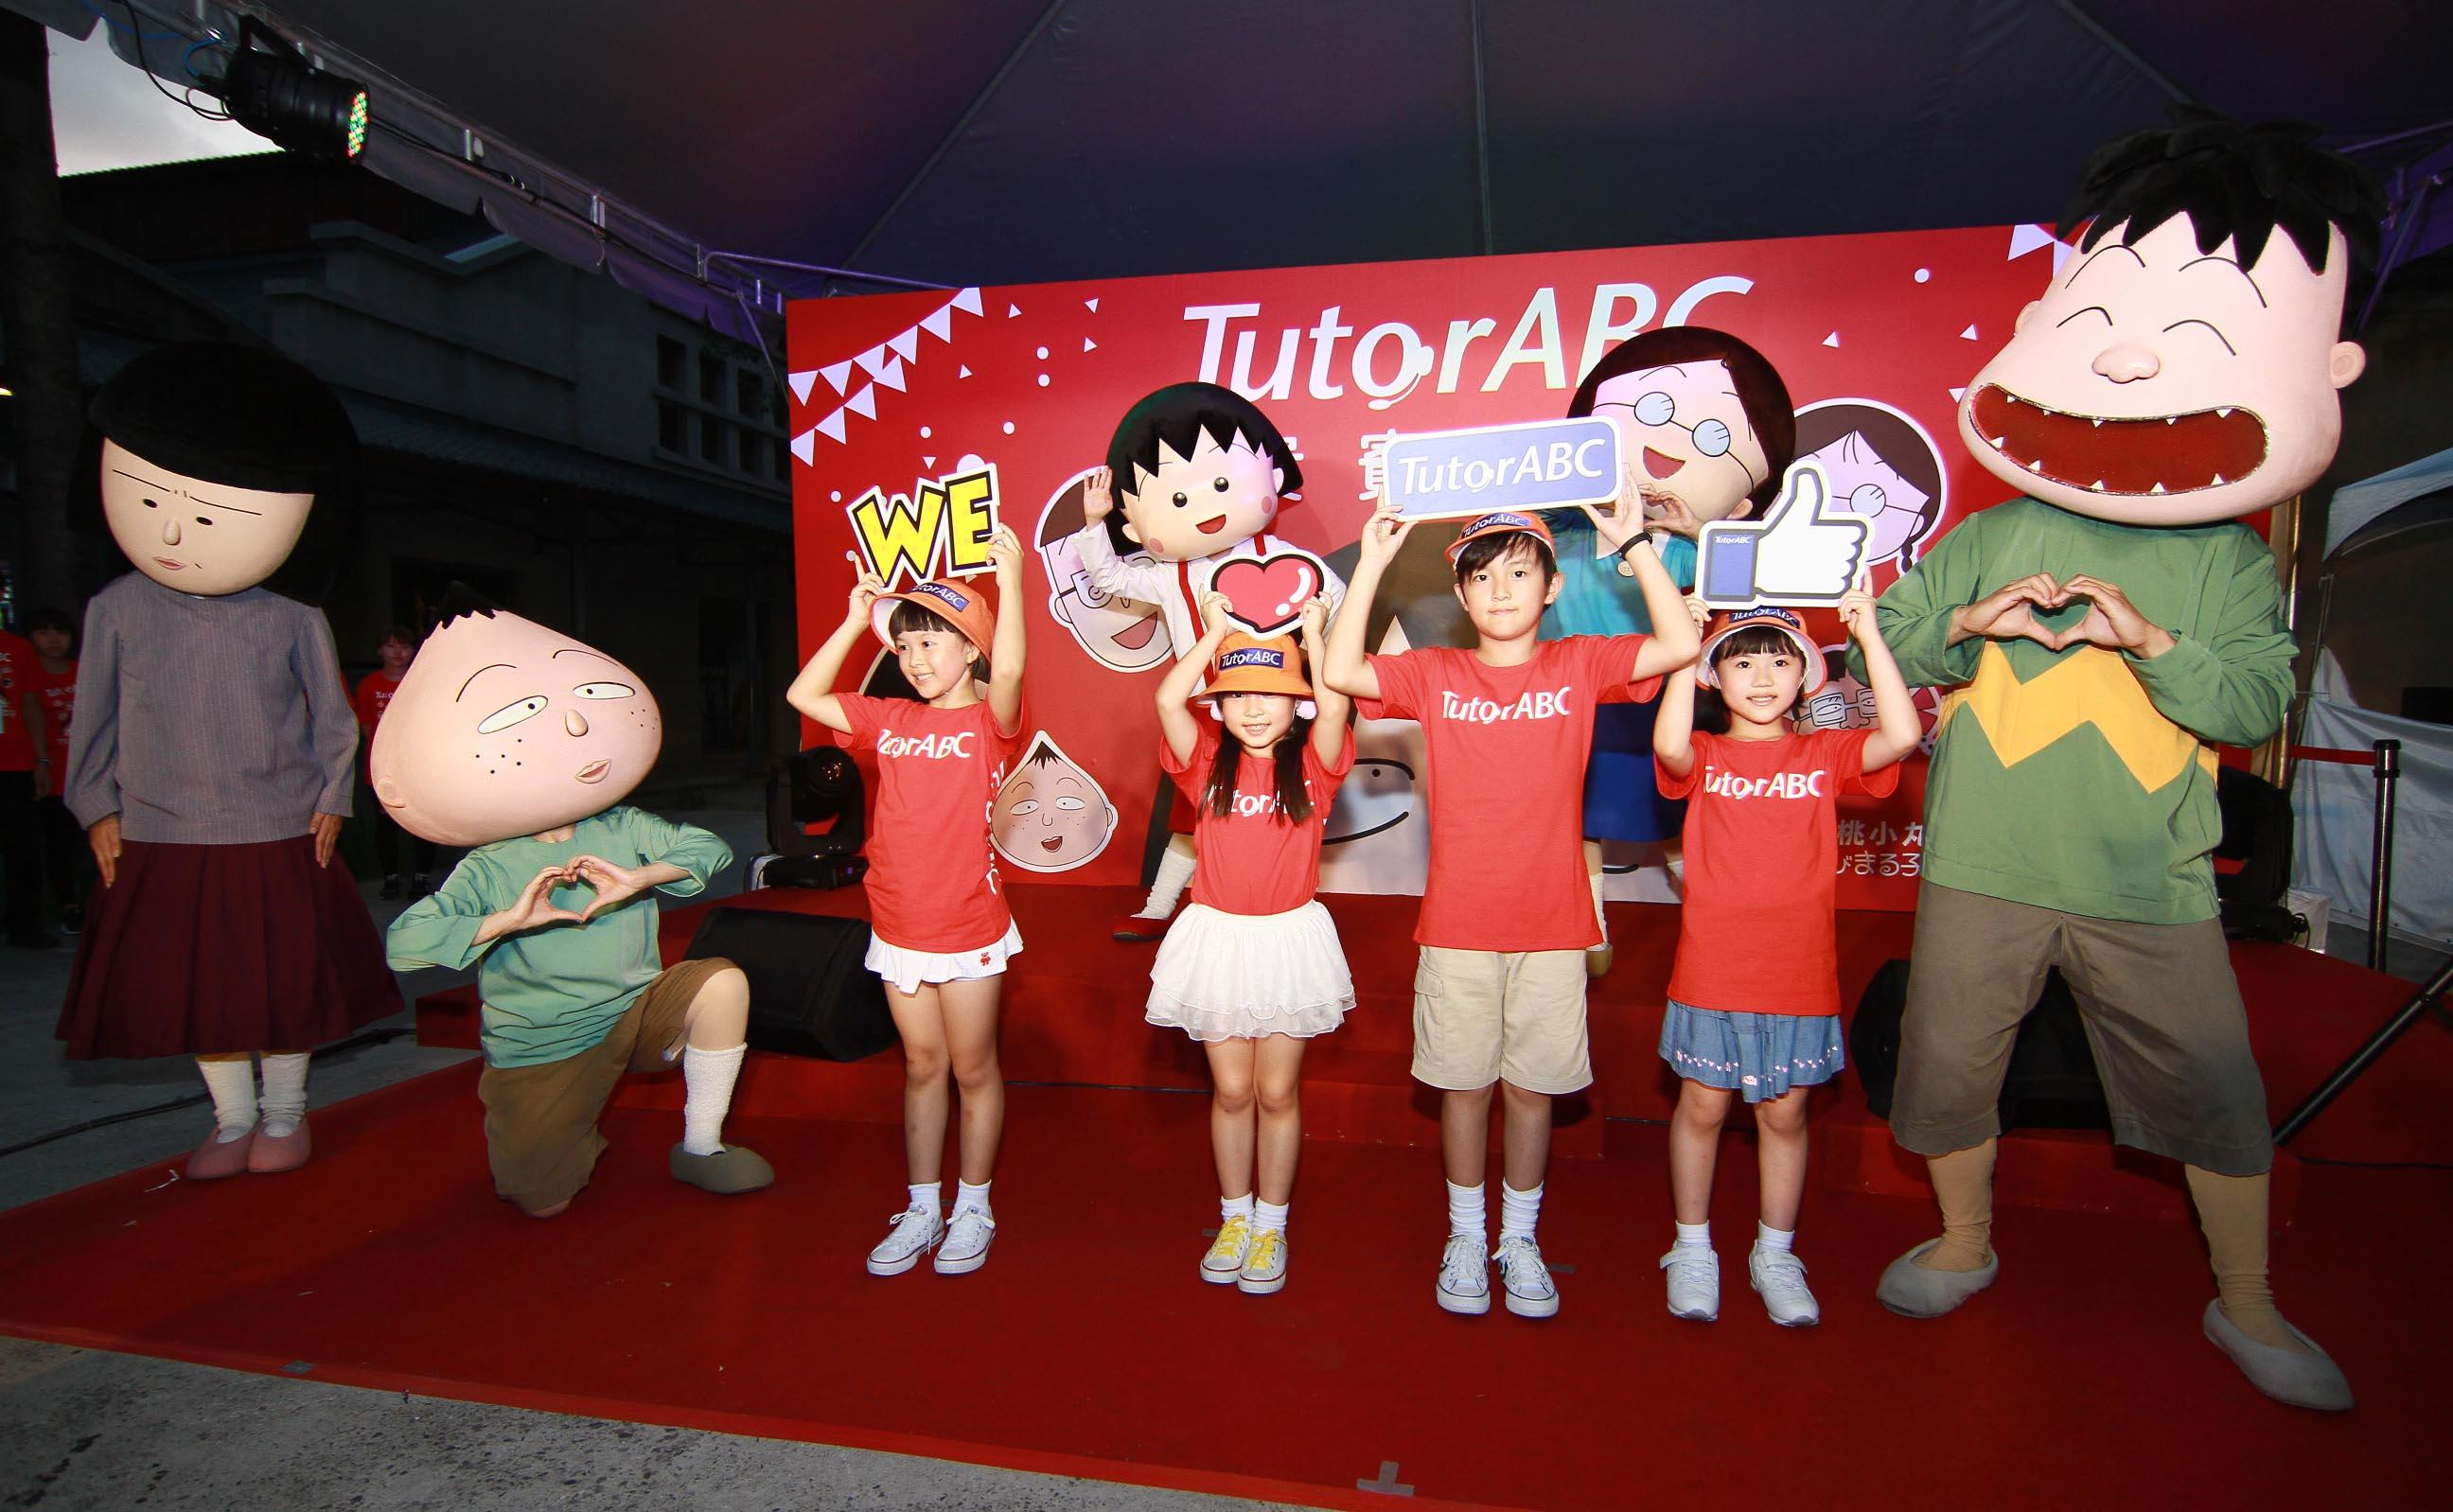 小朋友與小丸子共舞 We love TutorABC!